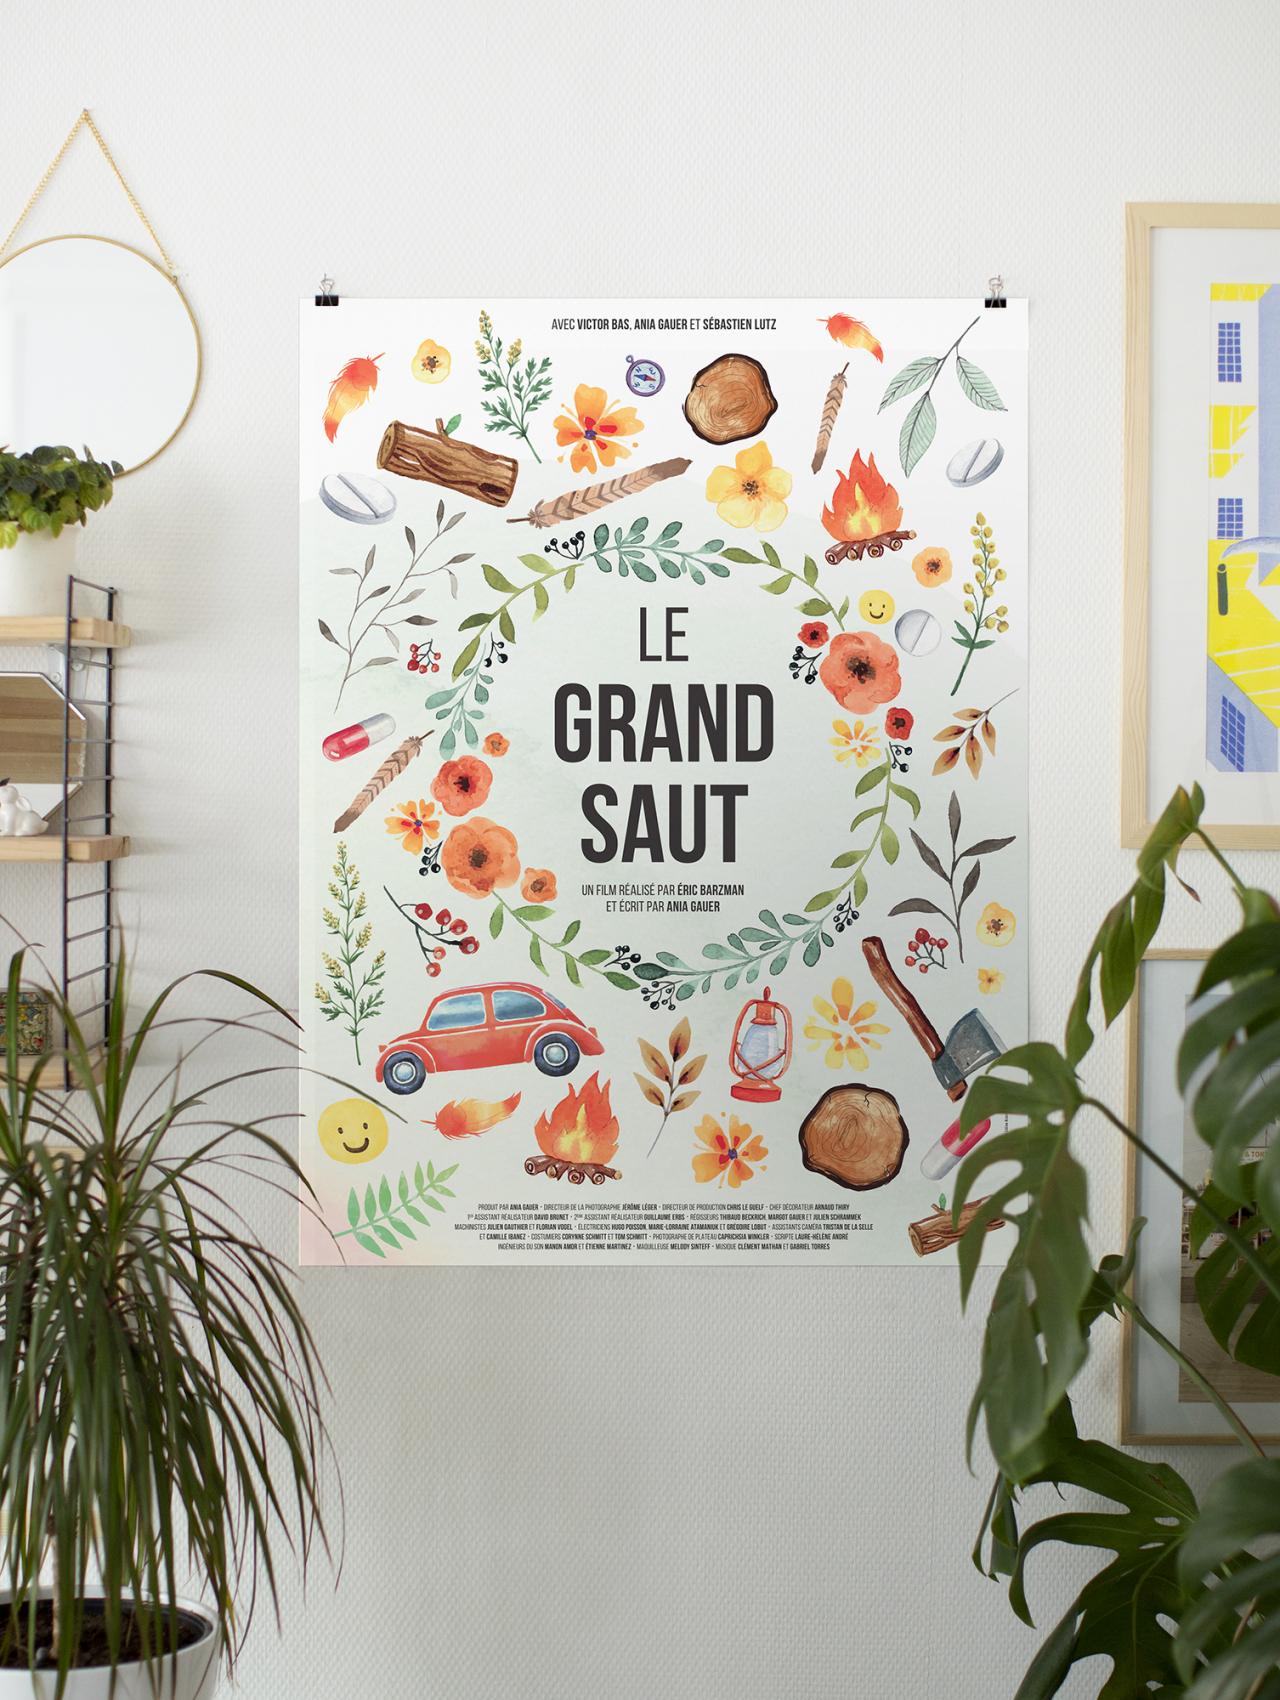 Le Grand Saut image #5